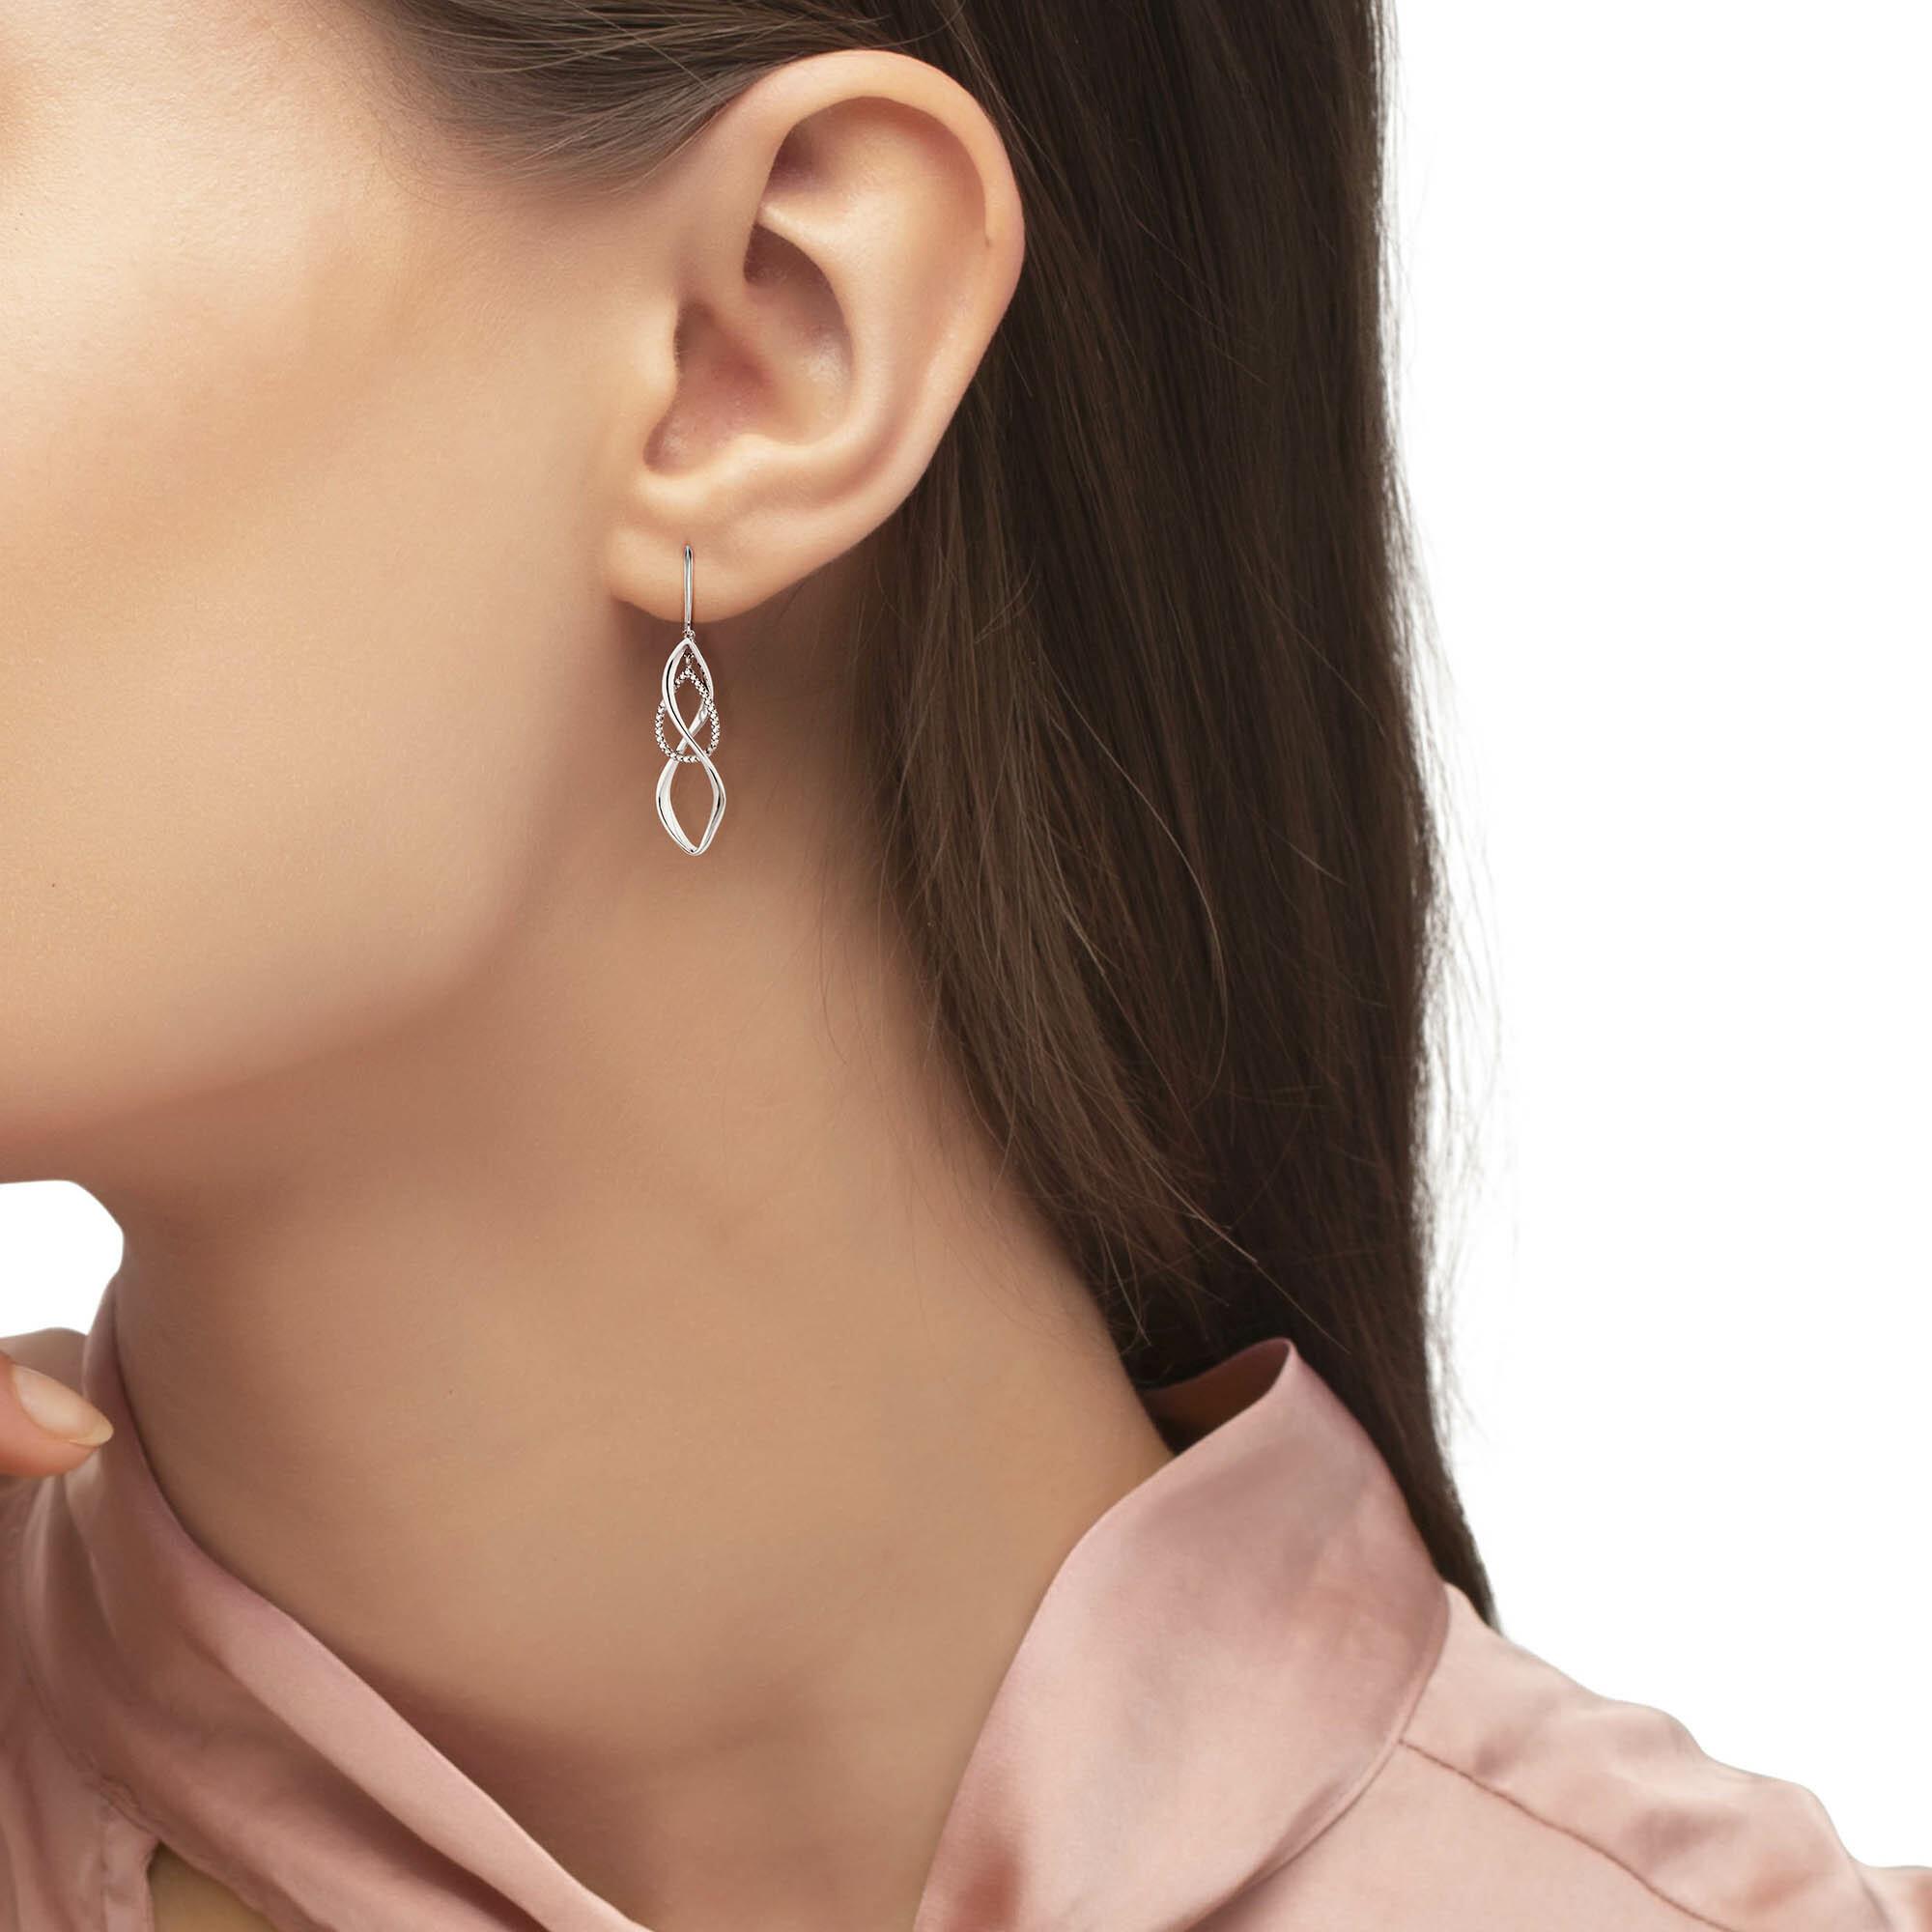 Ohrring für Damen lang, Silber 925, Zirkonia